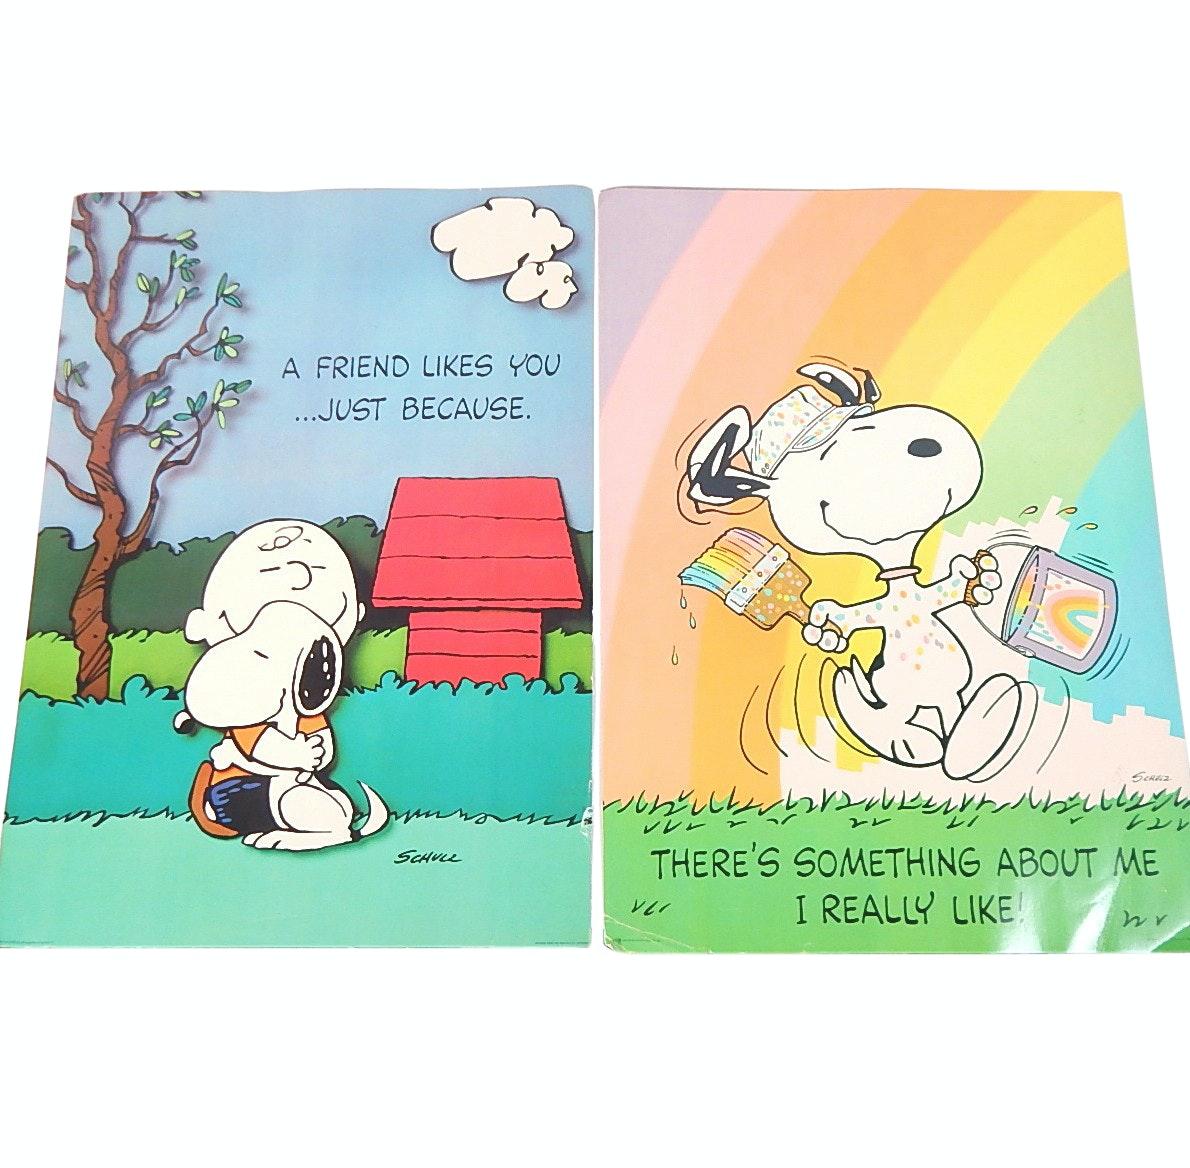 Vintage 1958 Hallmark Cardstock Charlie Brown and Snoopy Posters